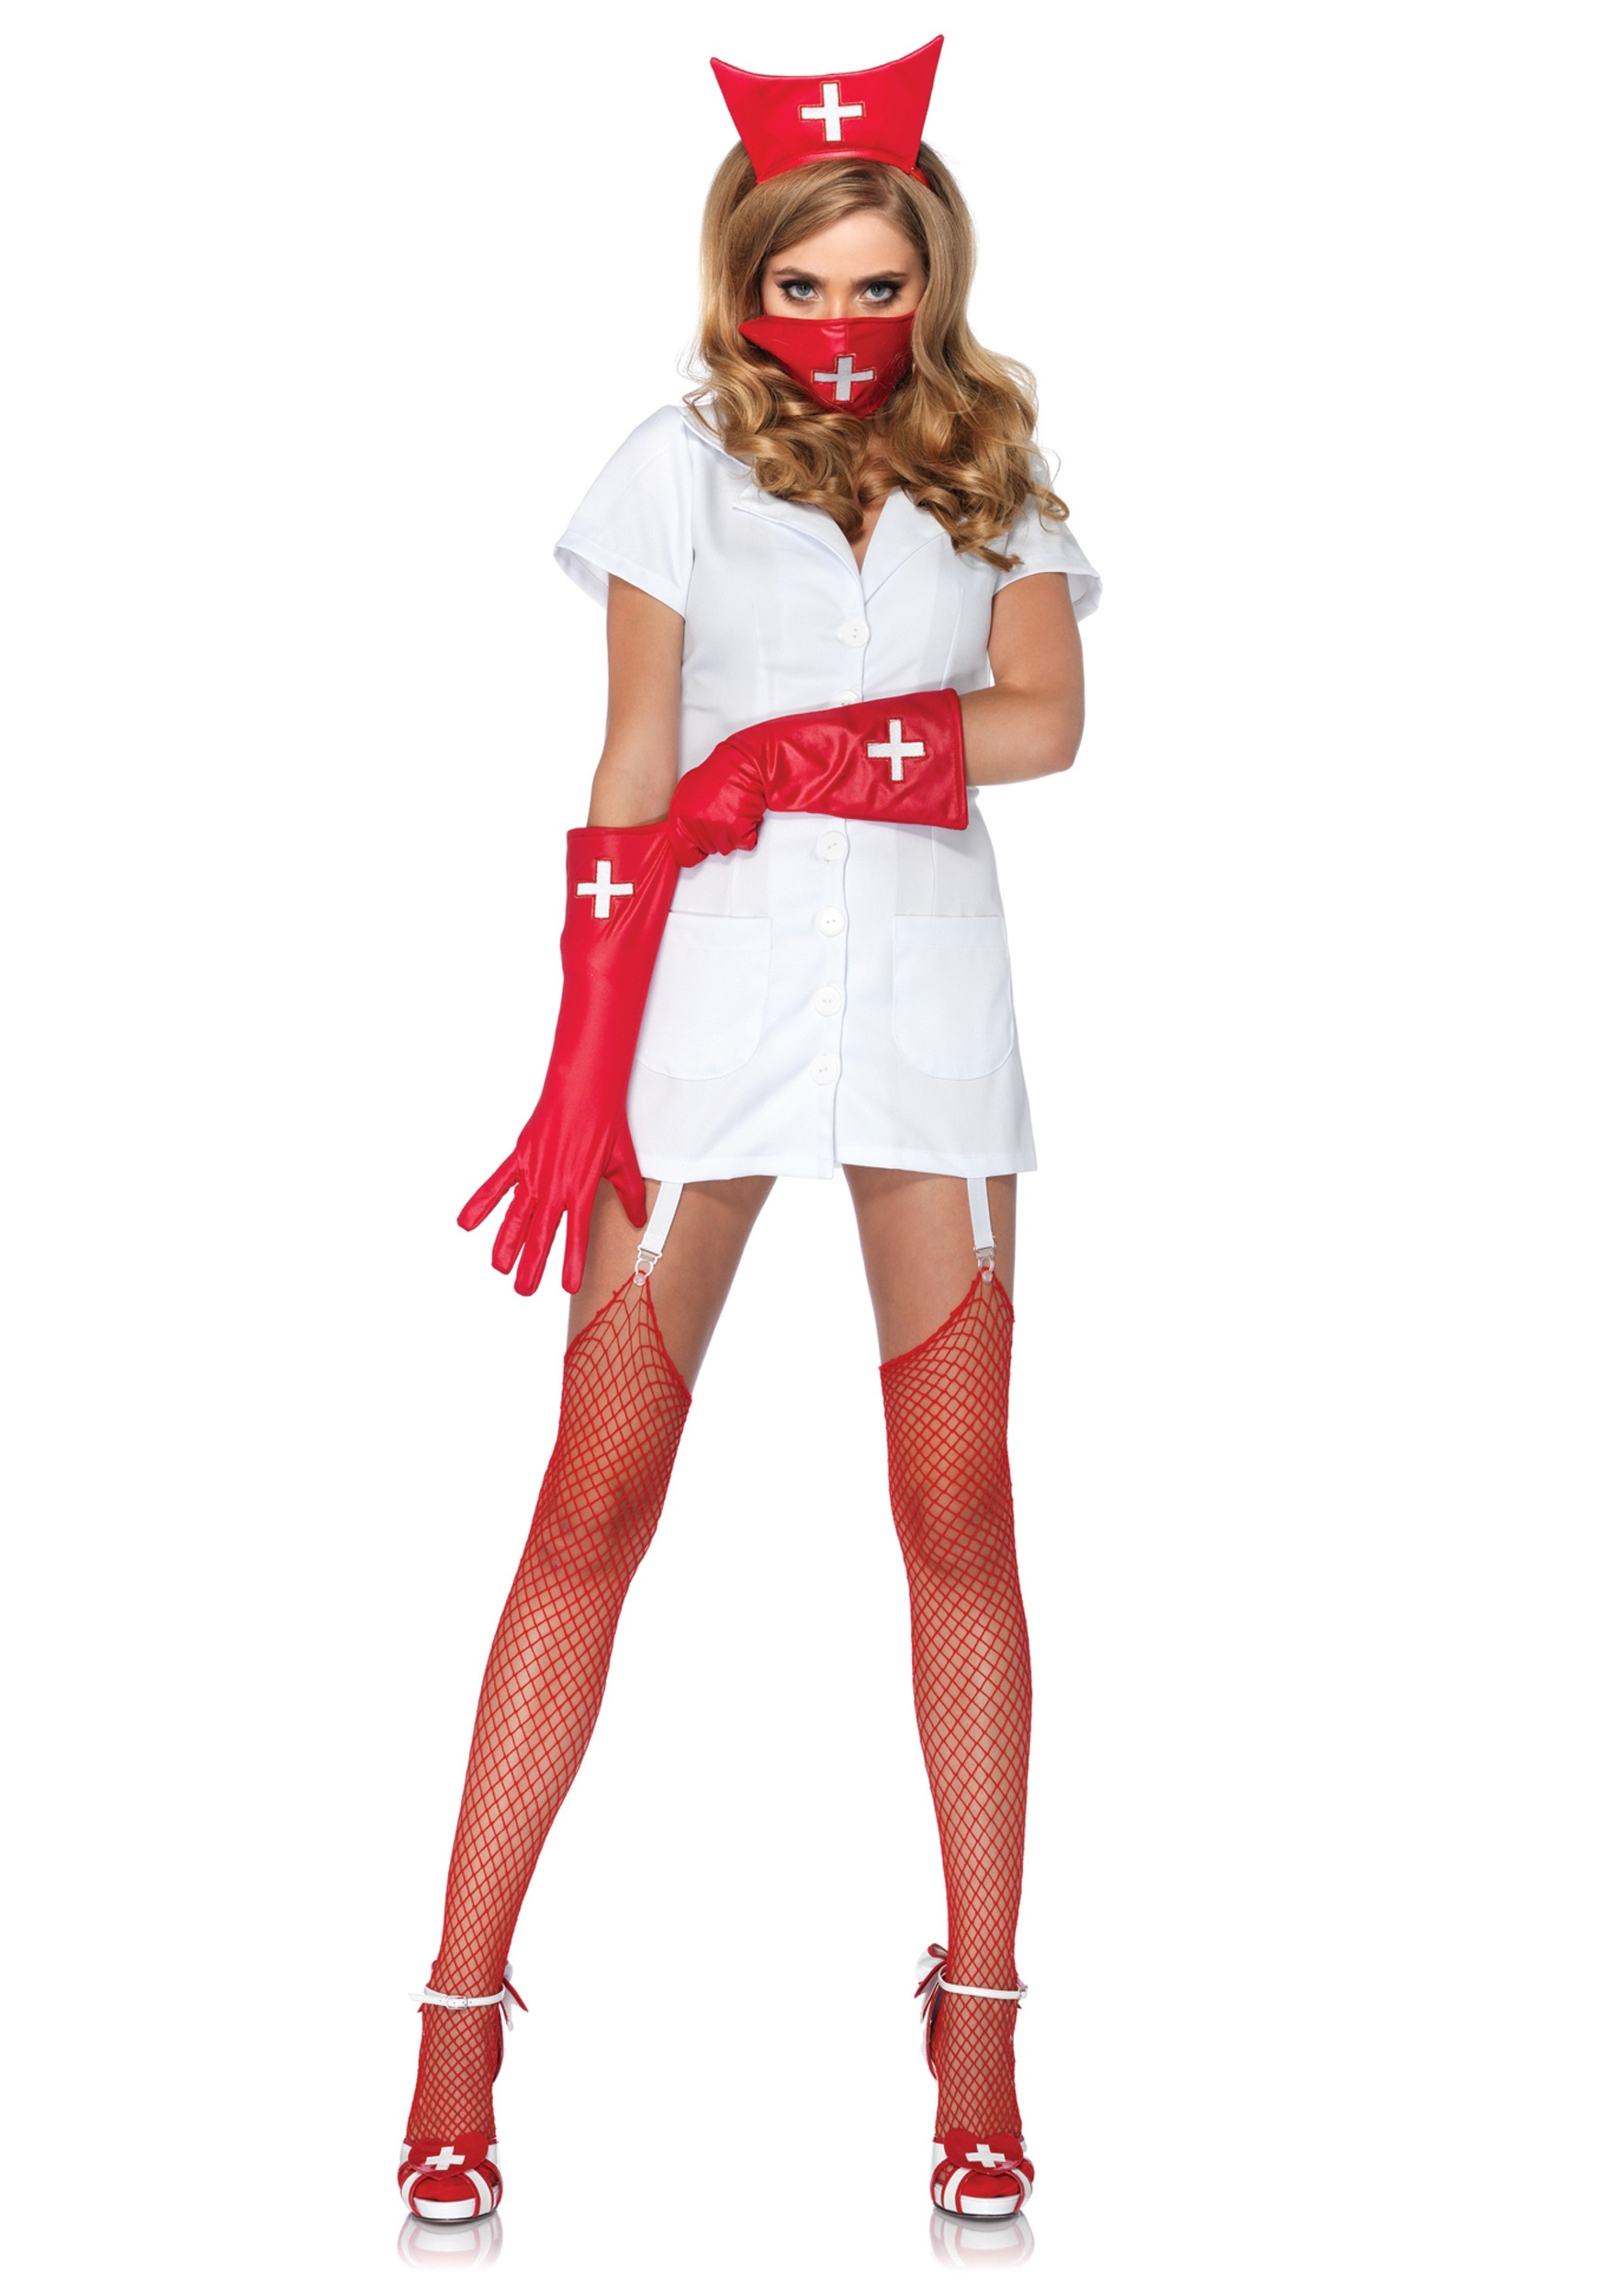 Sexy High School Glee Sports Cheerleading Costume Cheerleader Fancy Dr Wellbinder